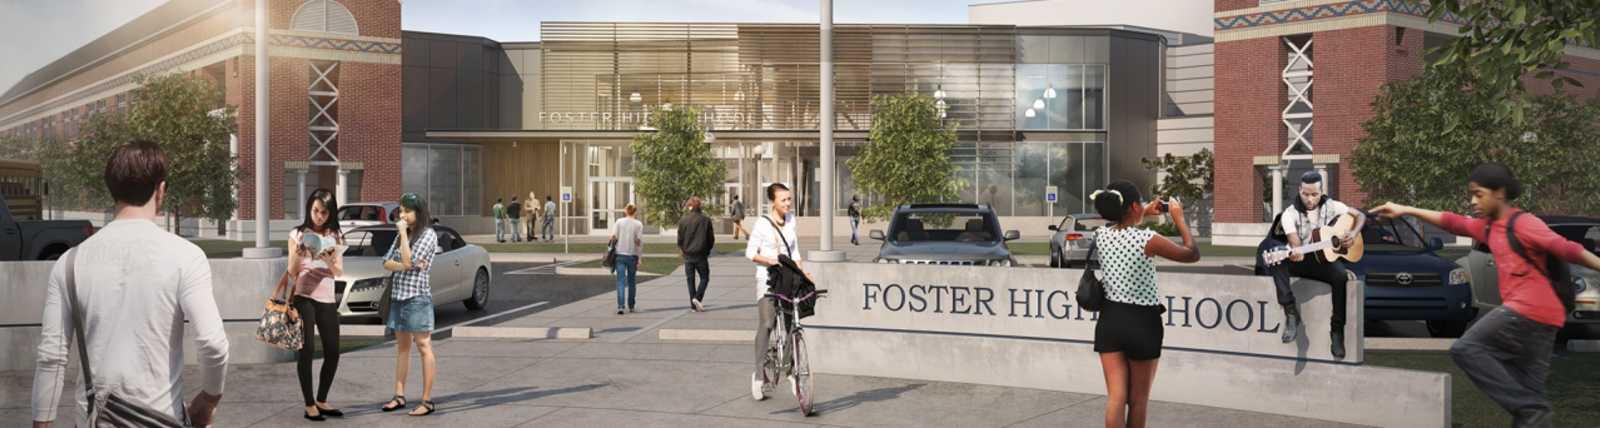 Foster High School & Performing Arts Center